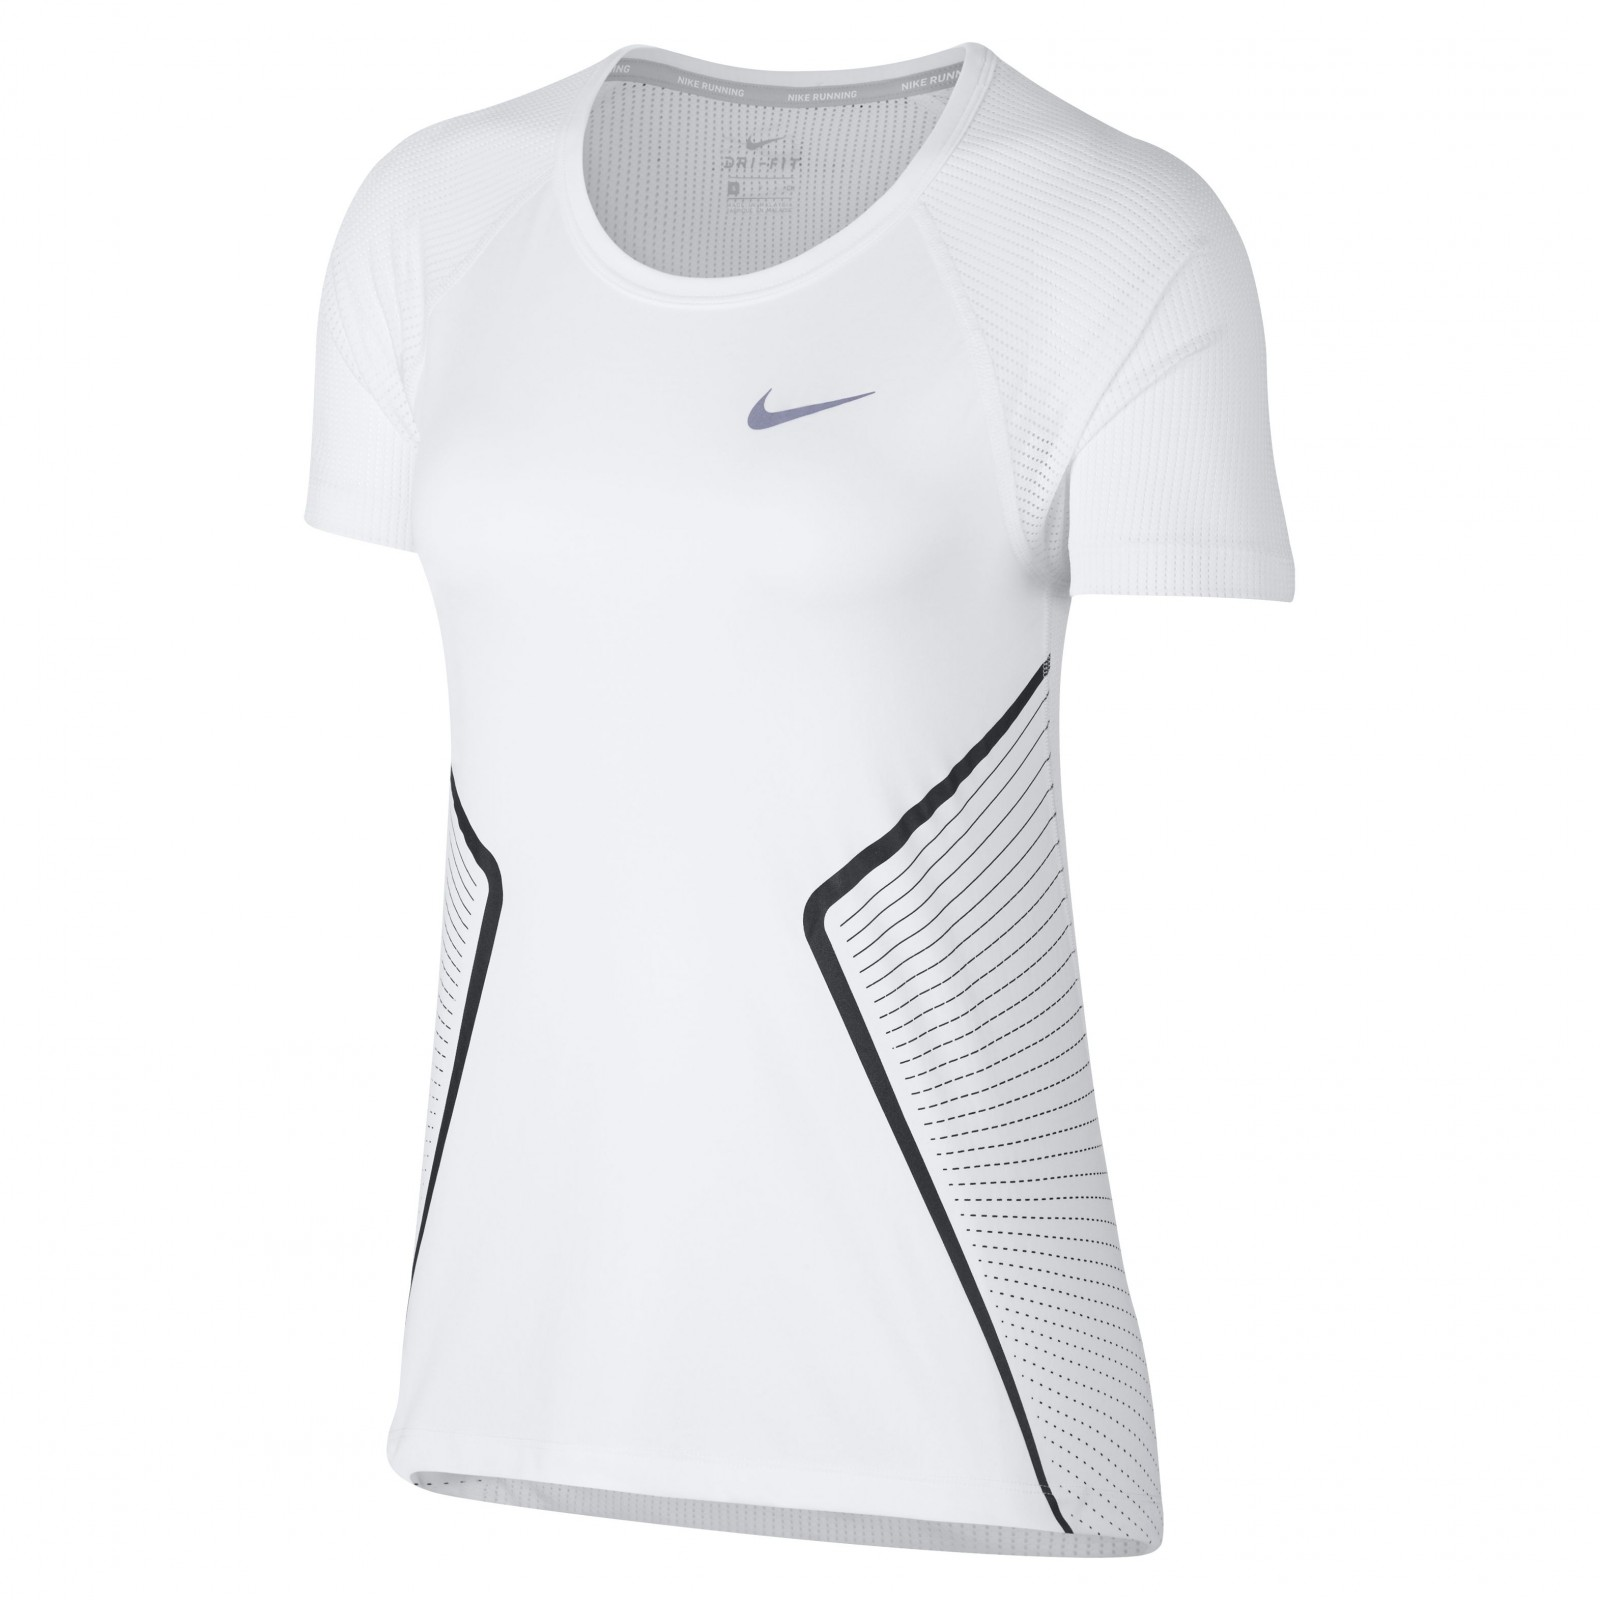 c7bfe21a44c3 Dámské Tričko Nike W NK DRY MILER TOP SS GX